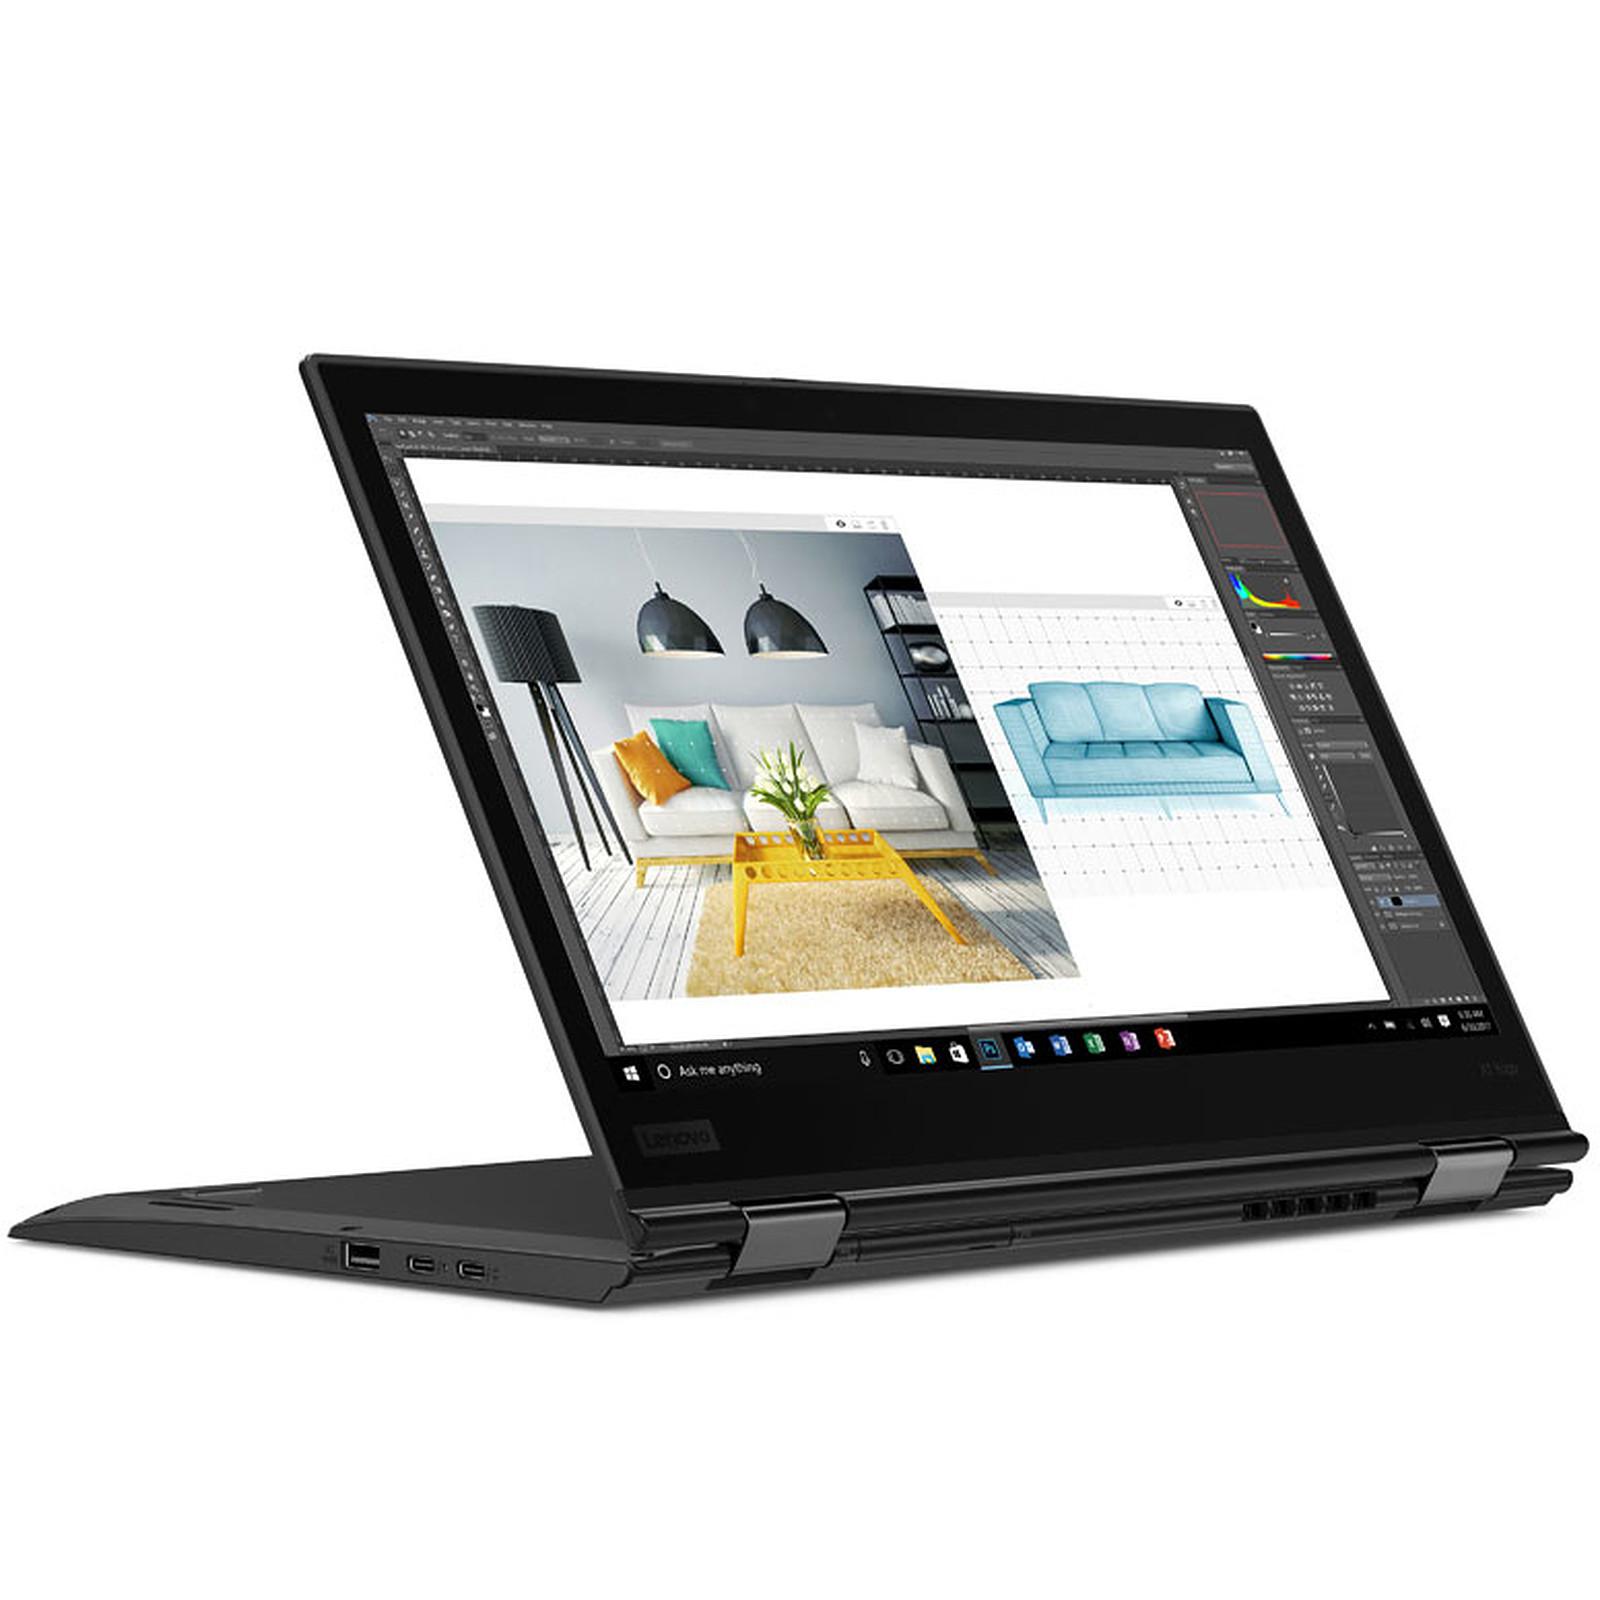 Lenovo ThinkPad X1 Yoga G3 (20LD002HFR)